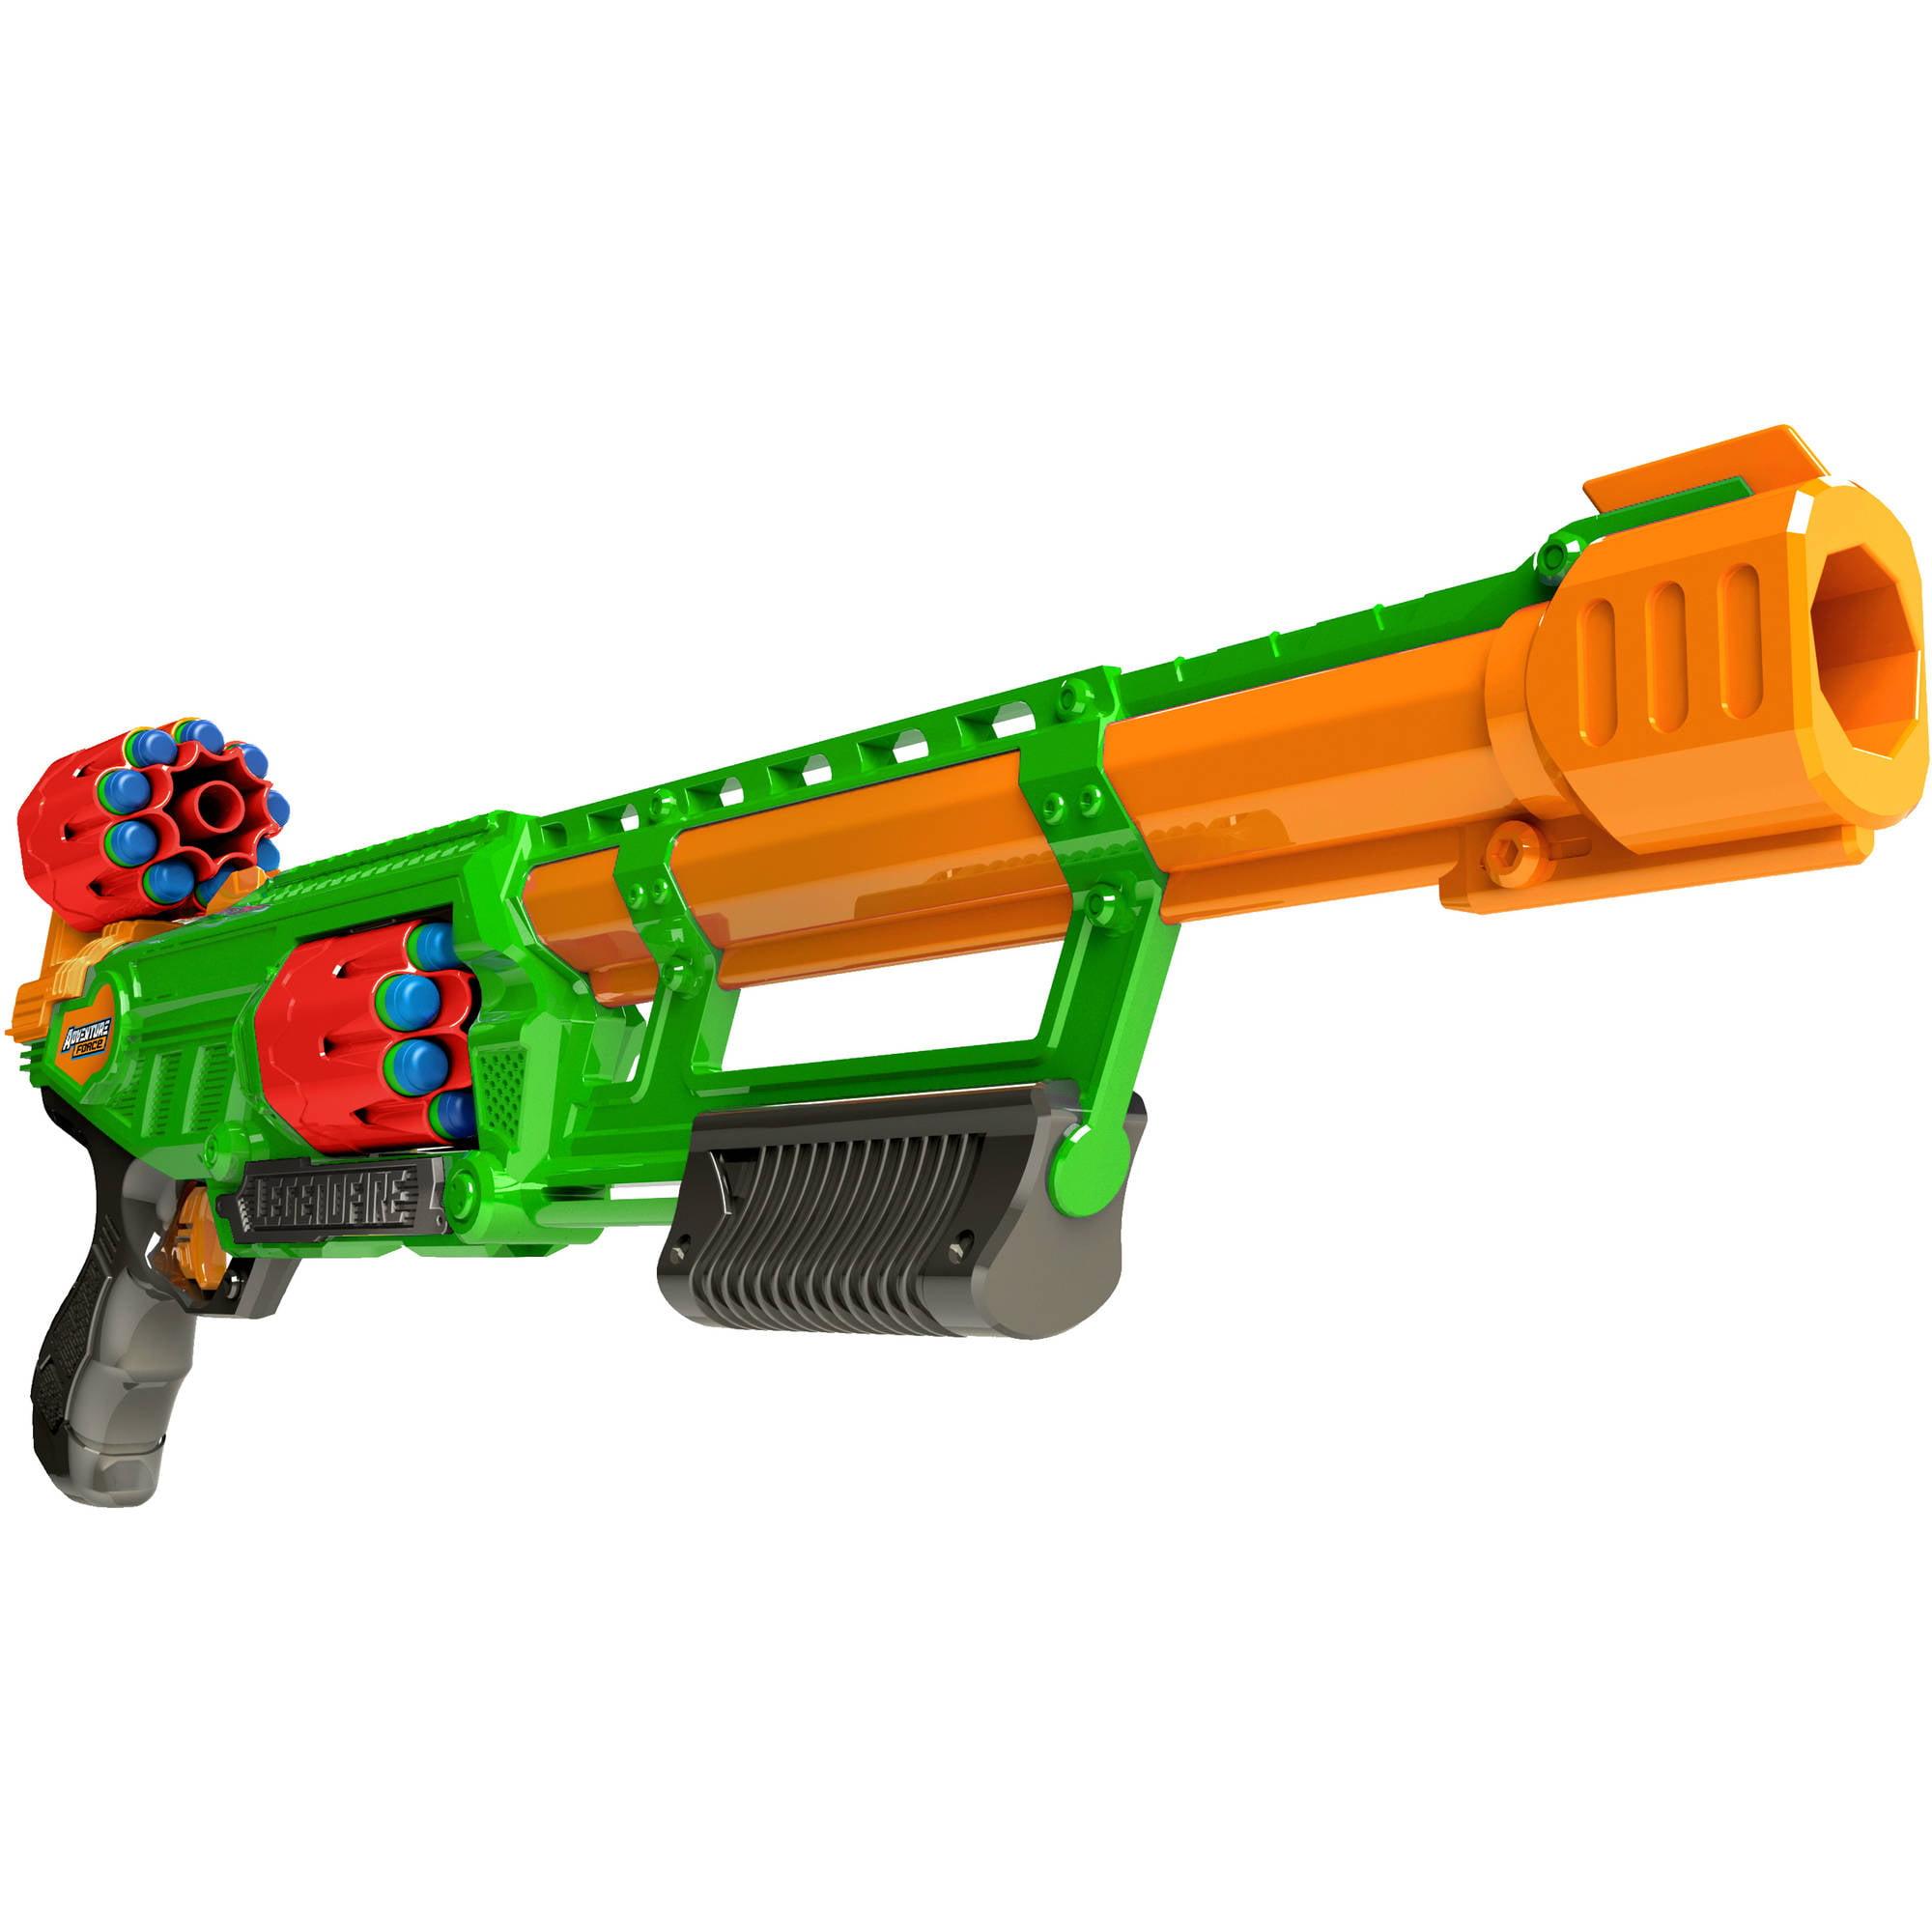 Adventure Force Legendfire Powershot Blaster